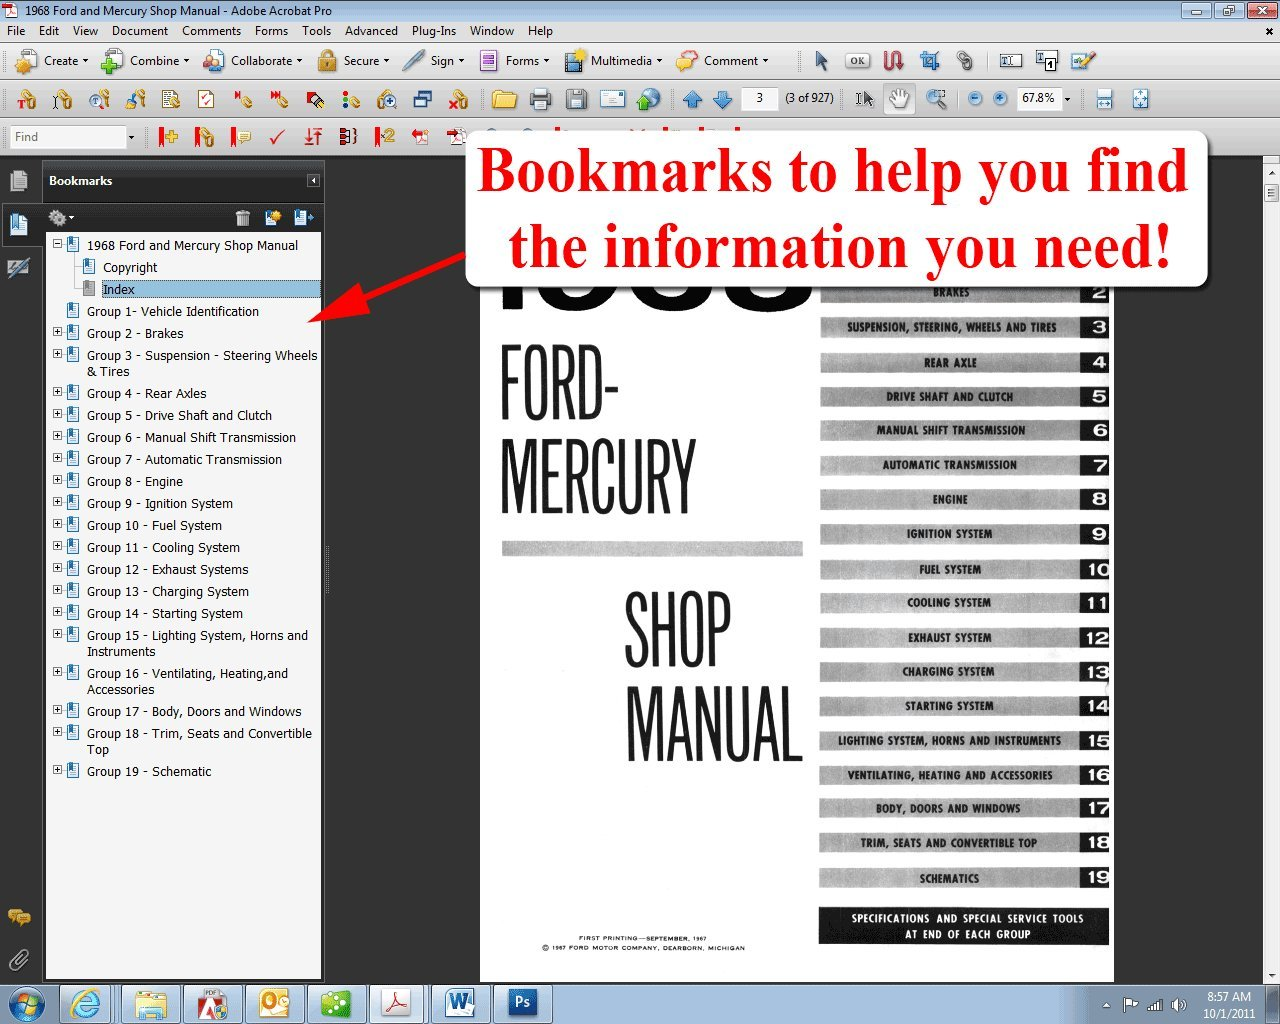 ford diagnostic engineering tool manuals rh vipaccess cf Ford Diagnostic Software Ford Diagnostic Tools Rotunda